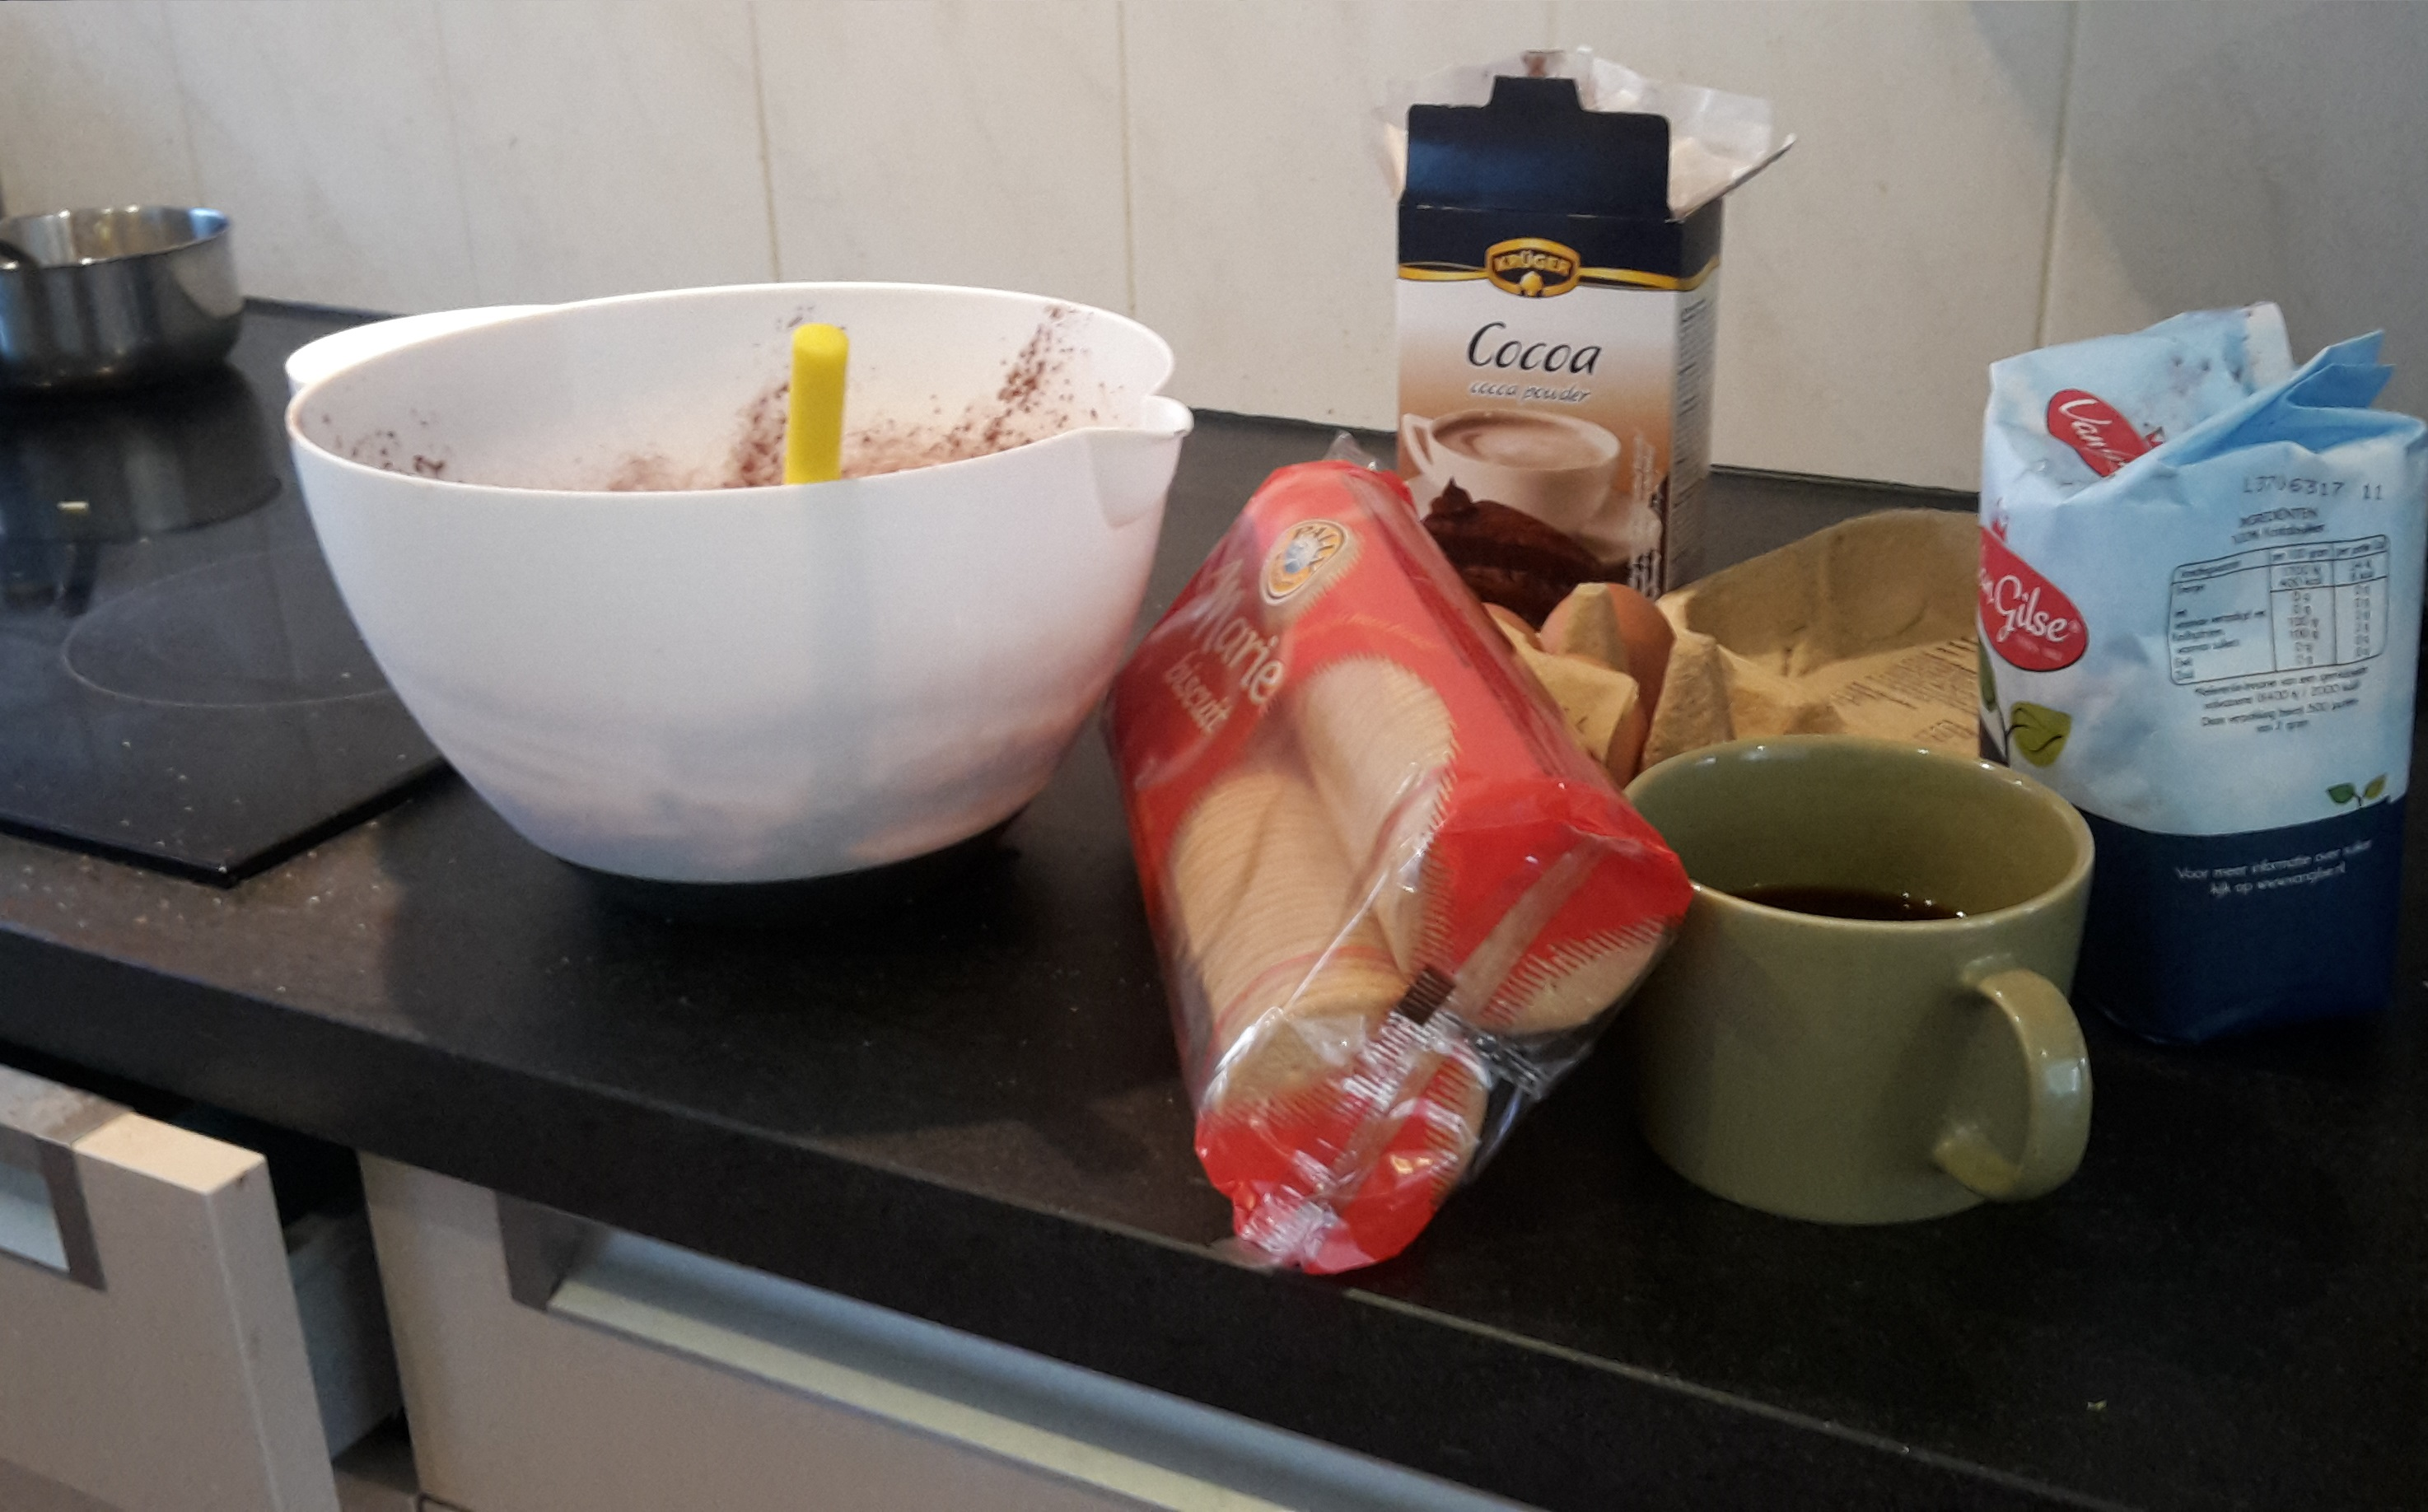 Stuff for arretjescake 2